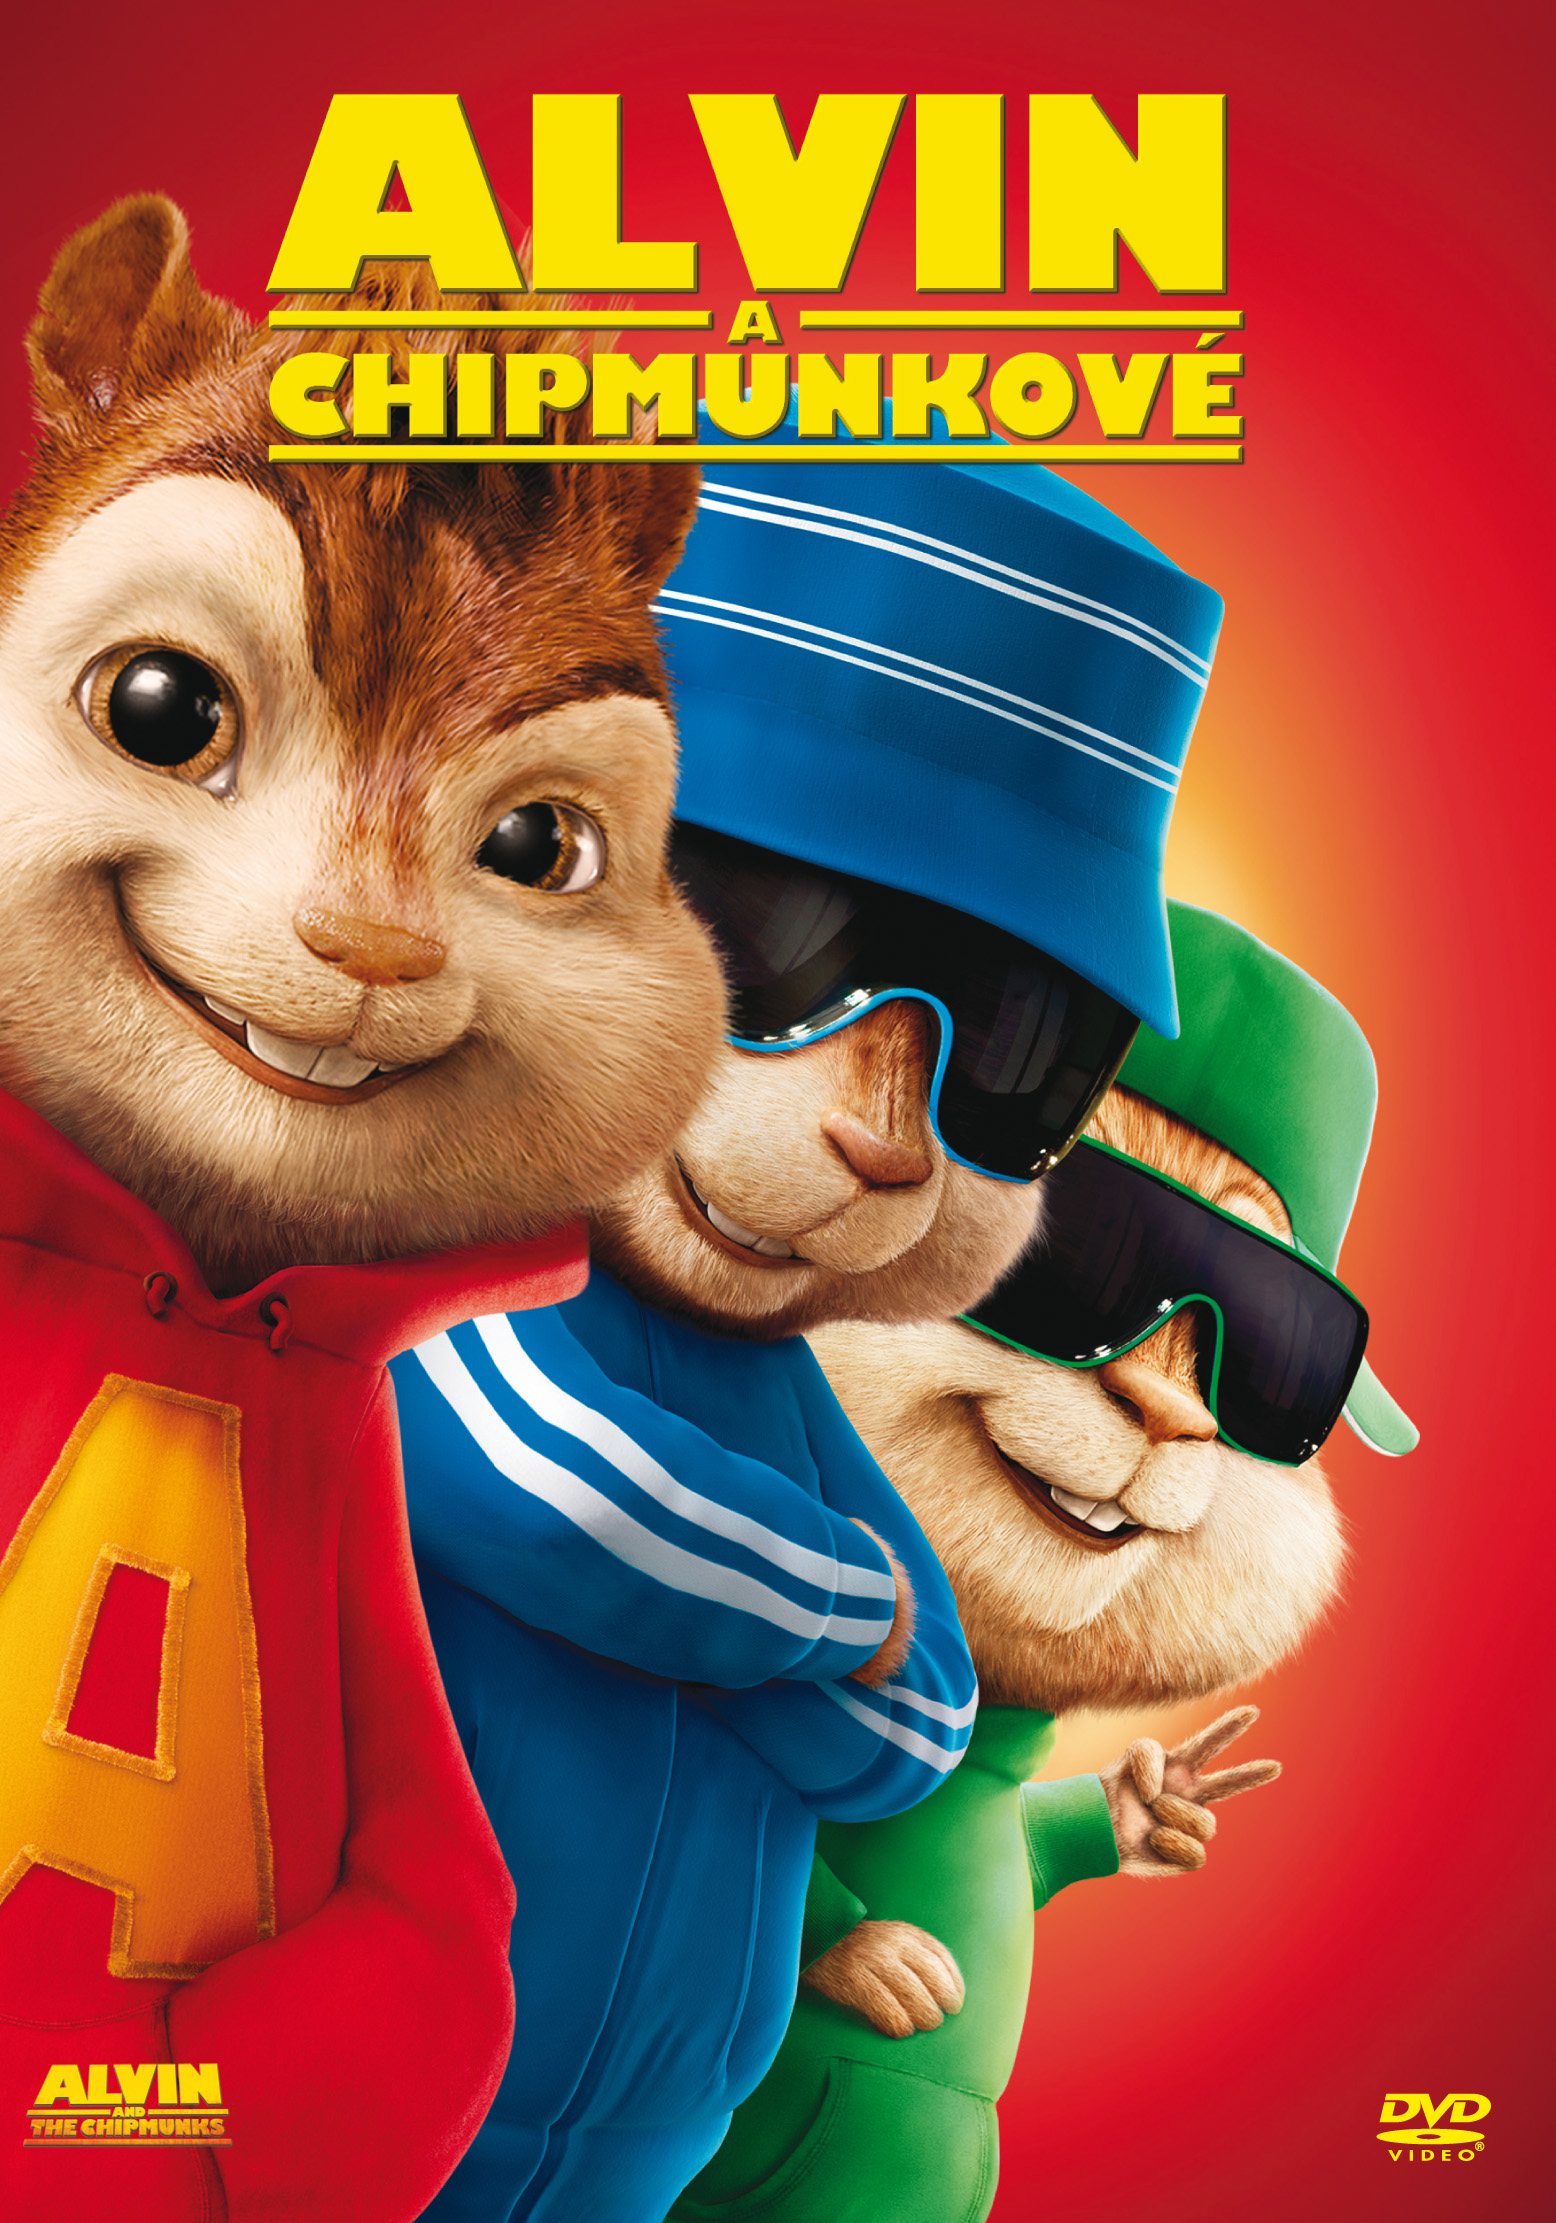 Film Alvin a Chipmunkové ke stažení - Film Alvin a Chipmunkové download